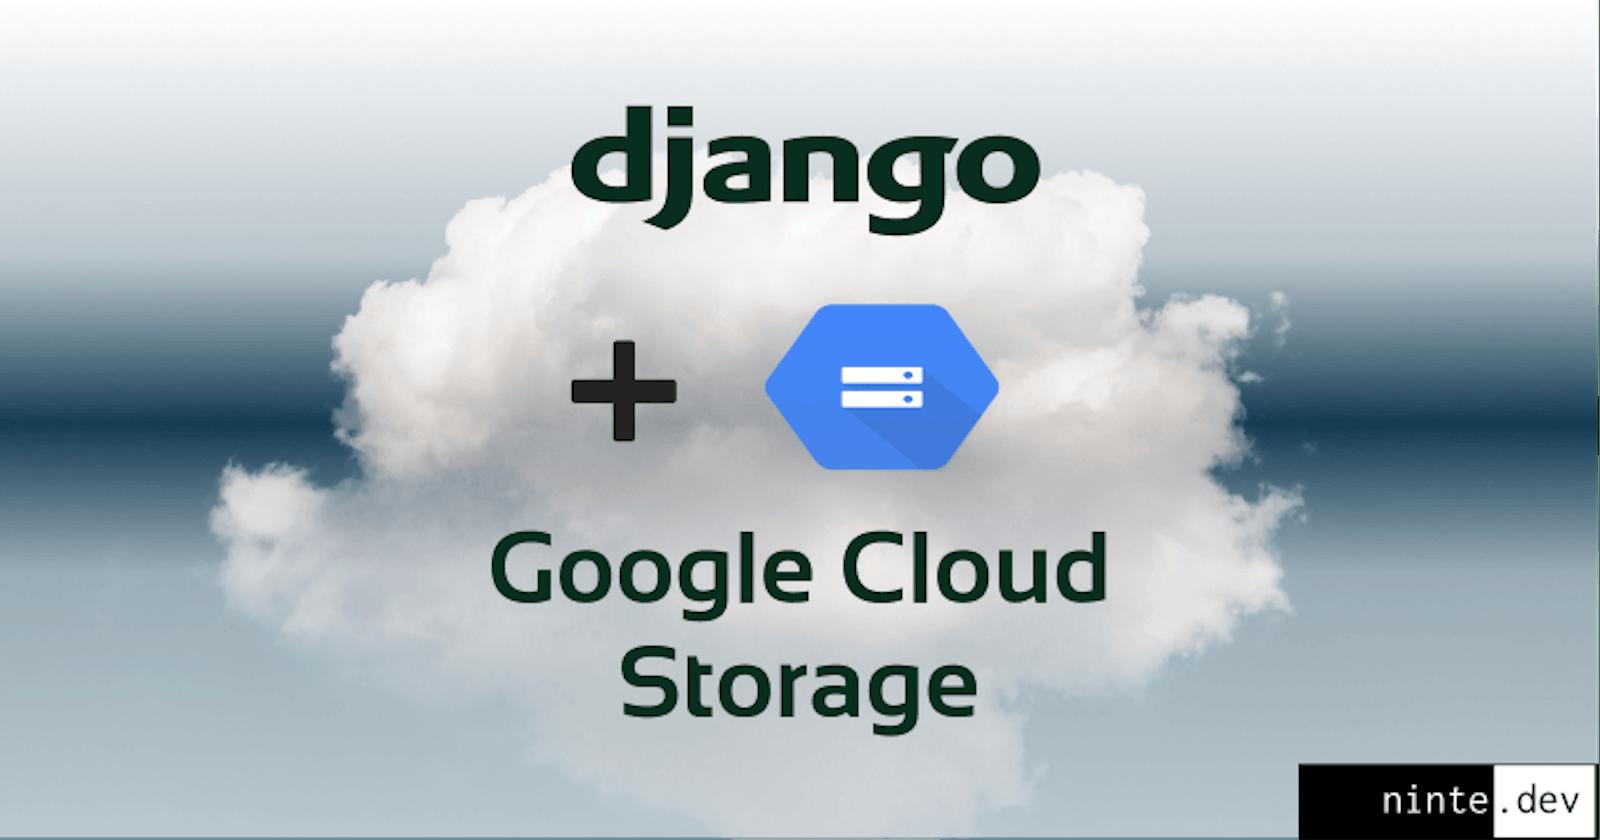 How to set up Google Cloud Storage on a Django web application